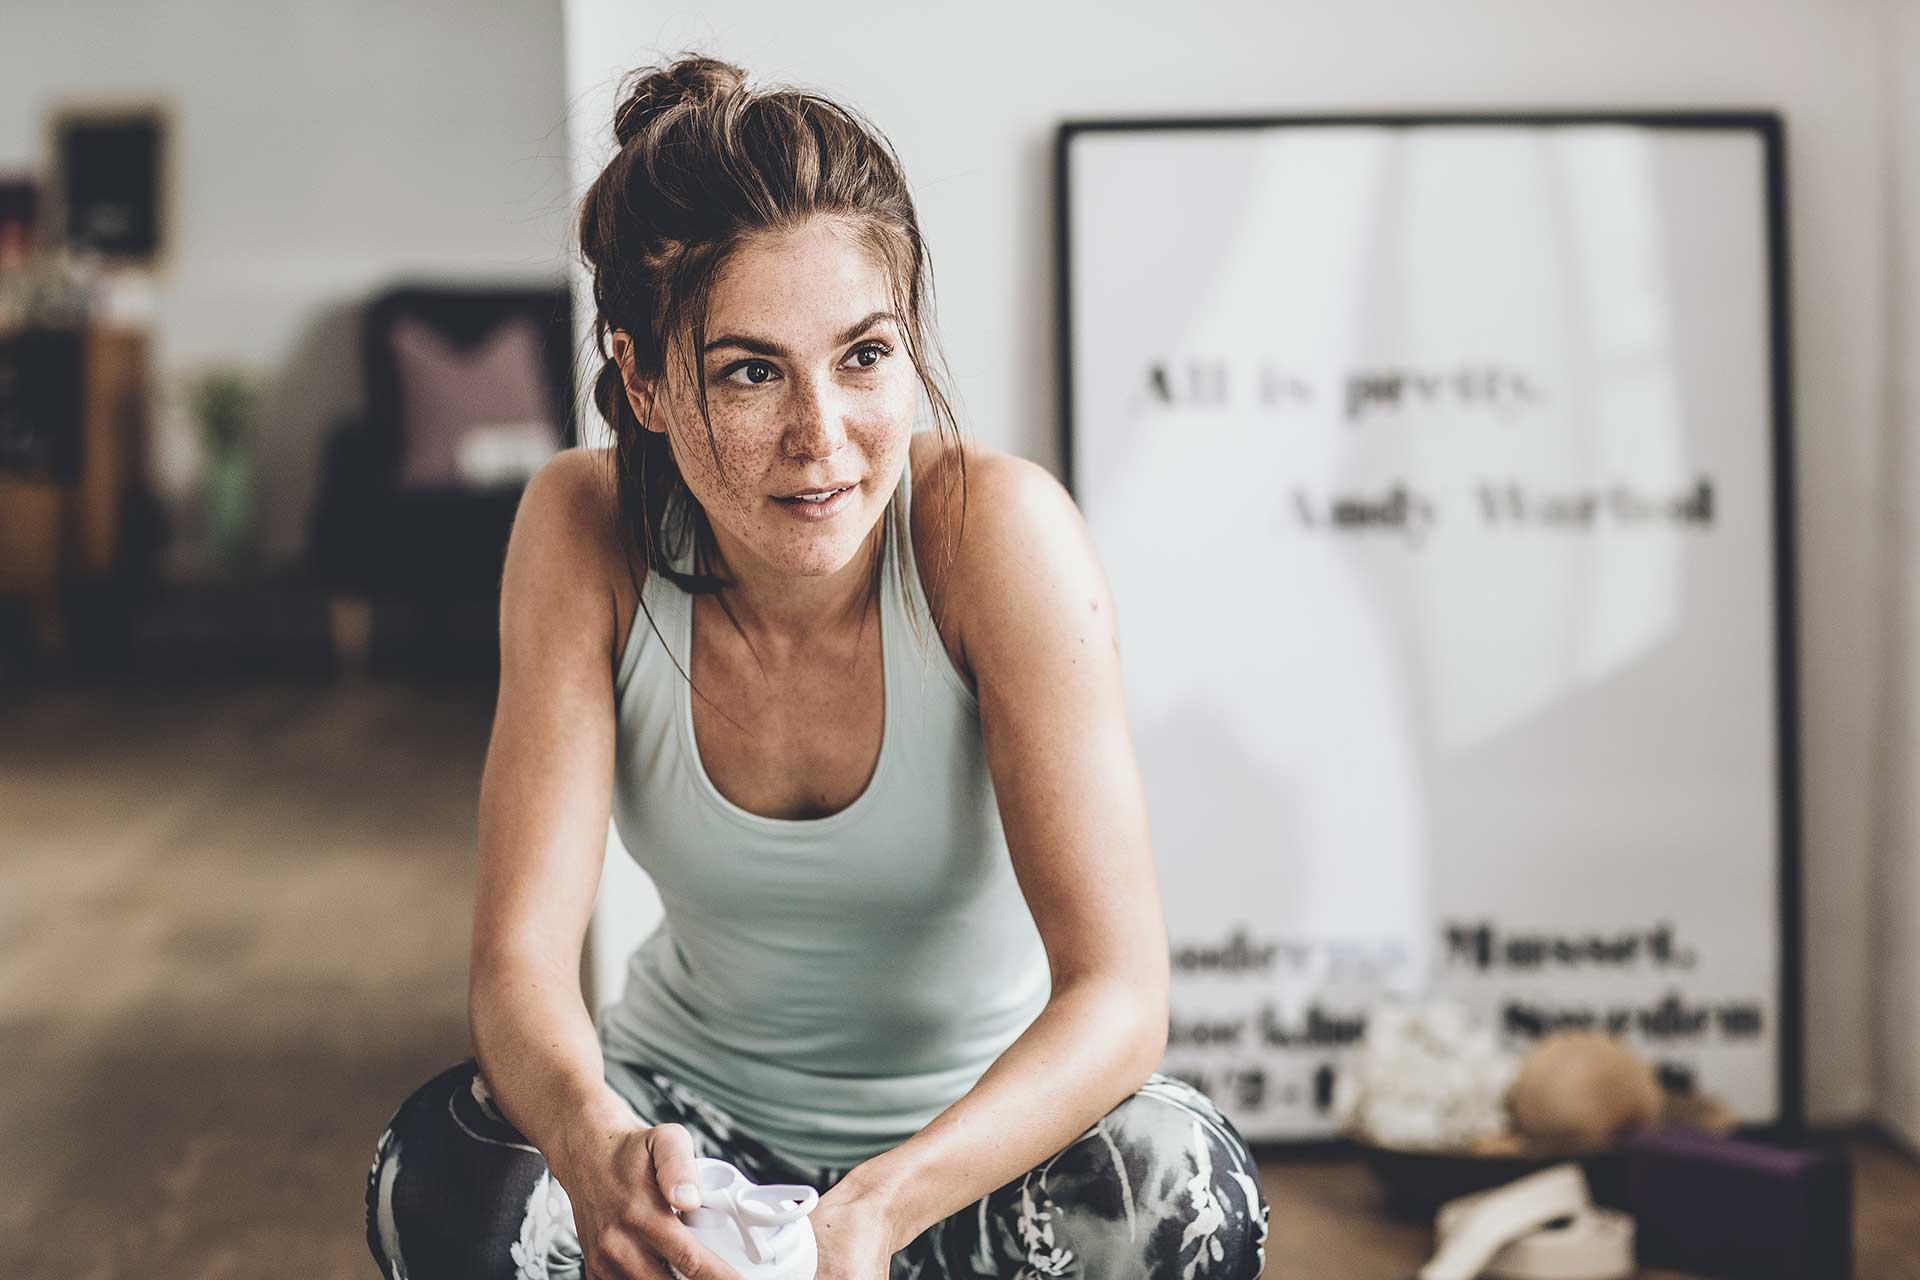 Sportfotograf Fitness Training Yoga Sport Frauen Bekleidung Engelhorn Stuttgart